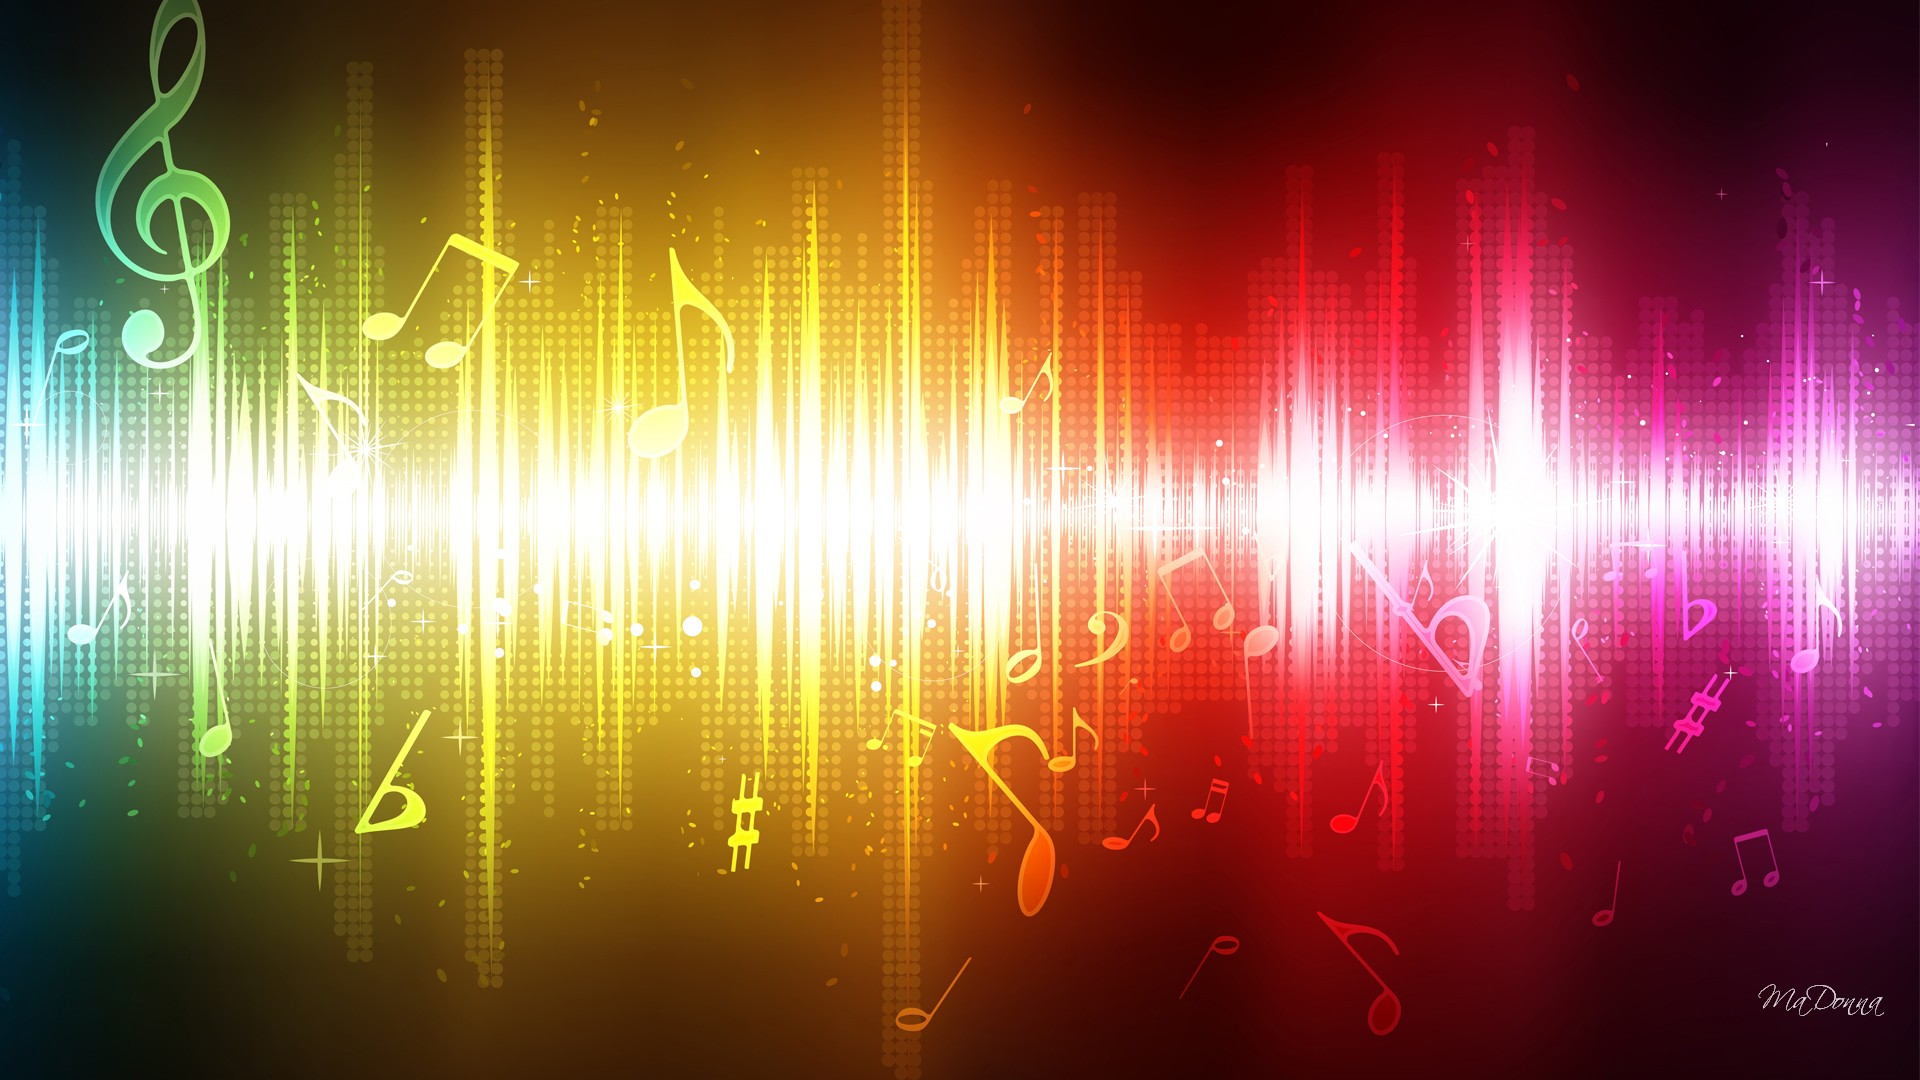 the sound of musicjpg 1920x1080